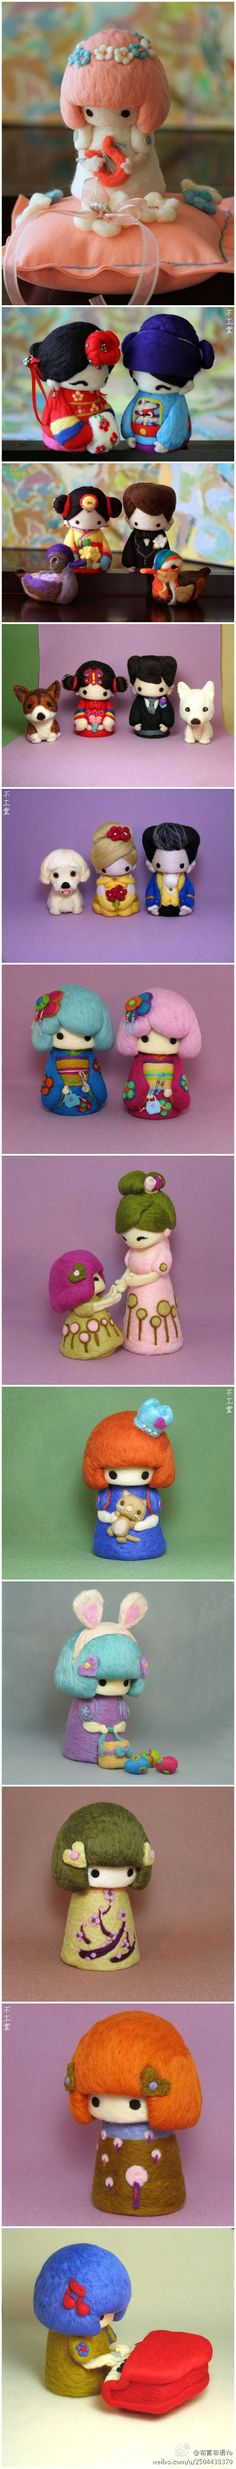 Very well made dolls - OMG!!!!!!!!!!! - 羊毛毡娃娃